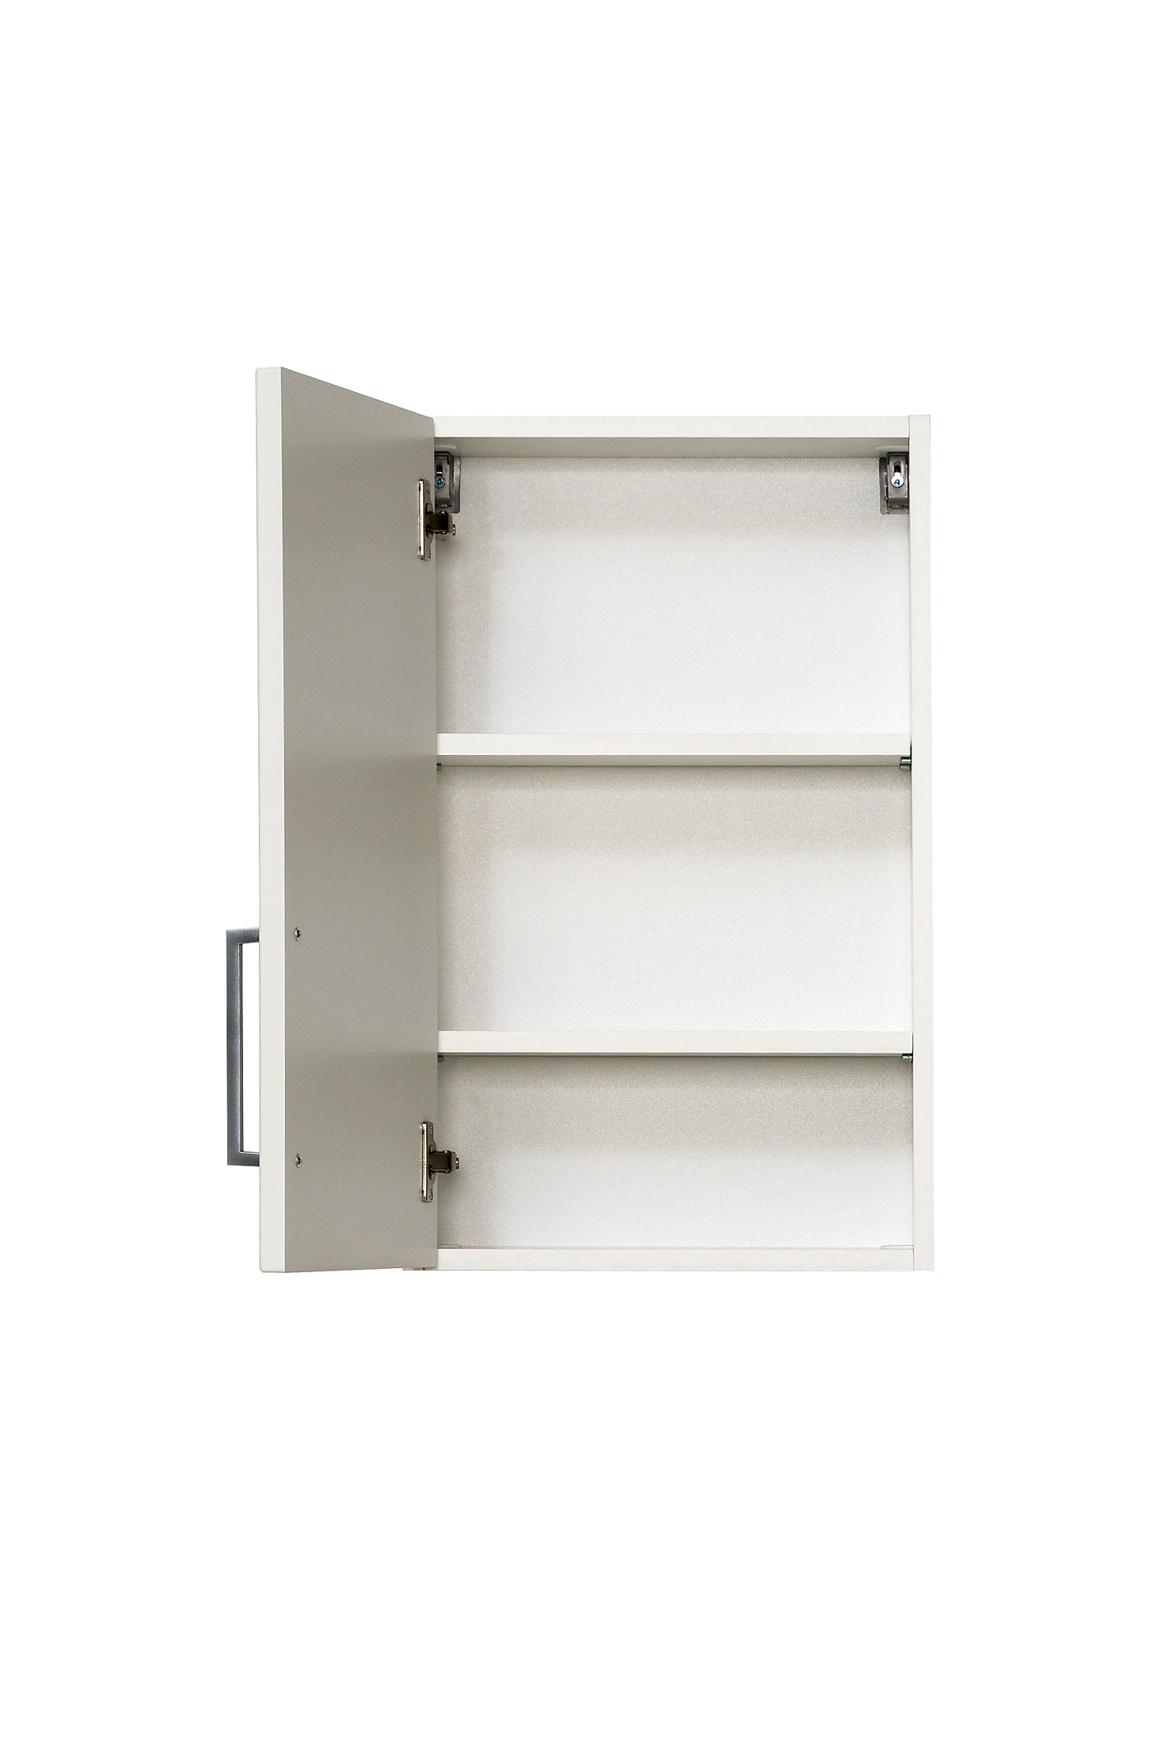 bad h ngeschrank barolo 1 t rig 40 cm breit wei matt 4250163767968 ebay. Black Bedroom Furniture Sets. Home Design Ideas